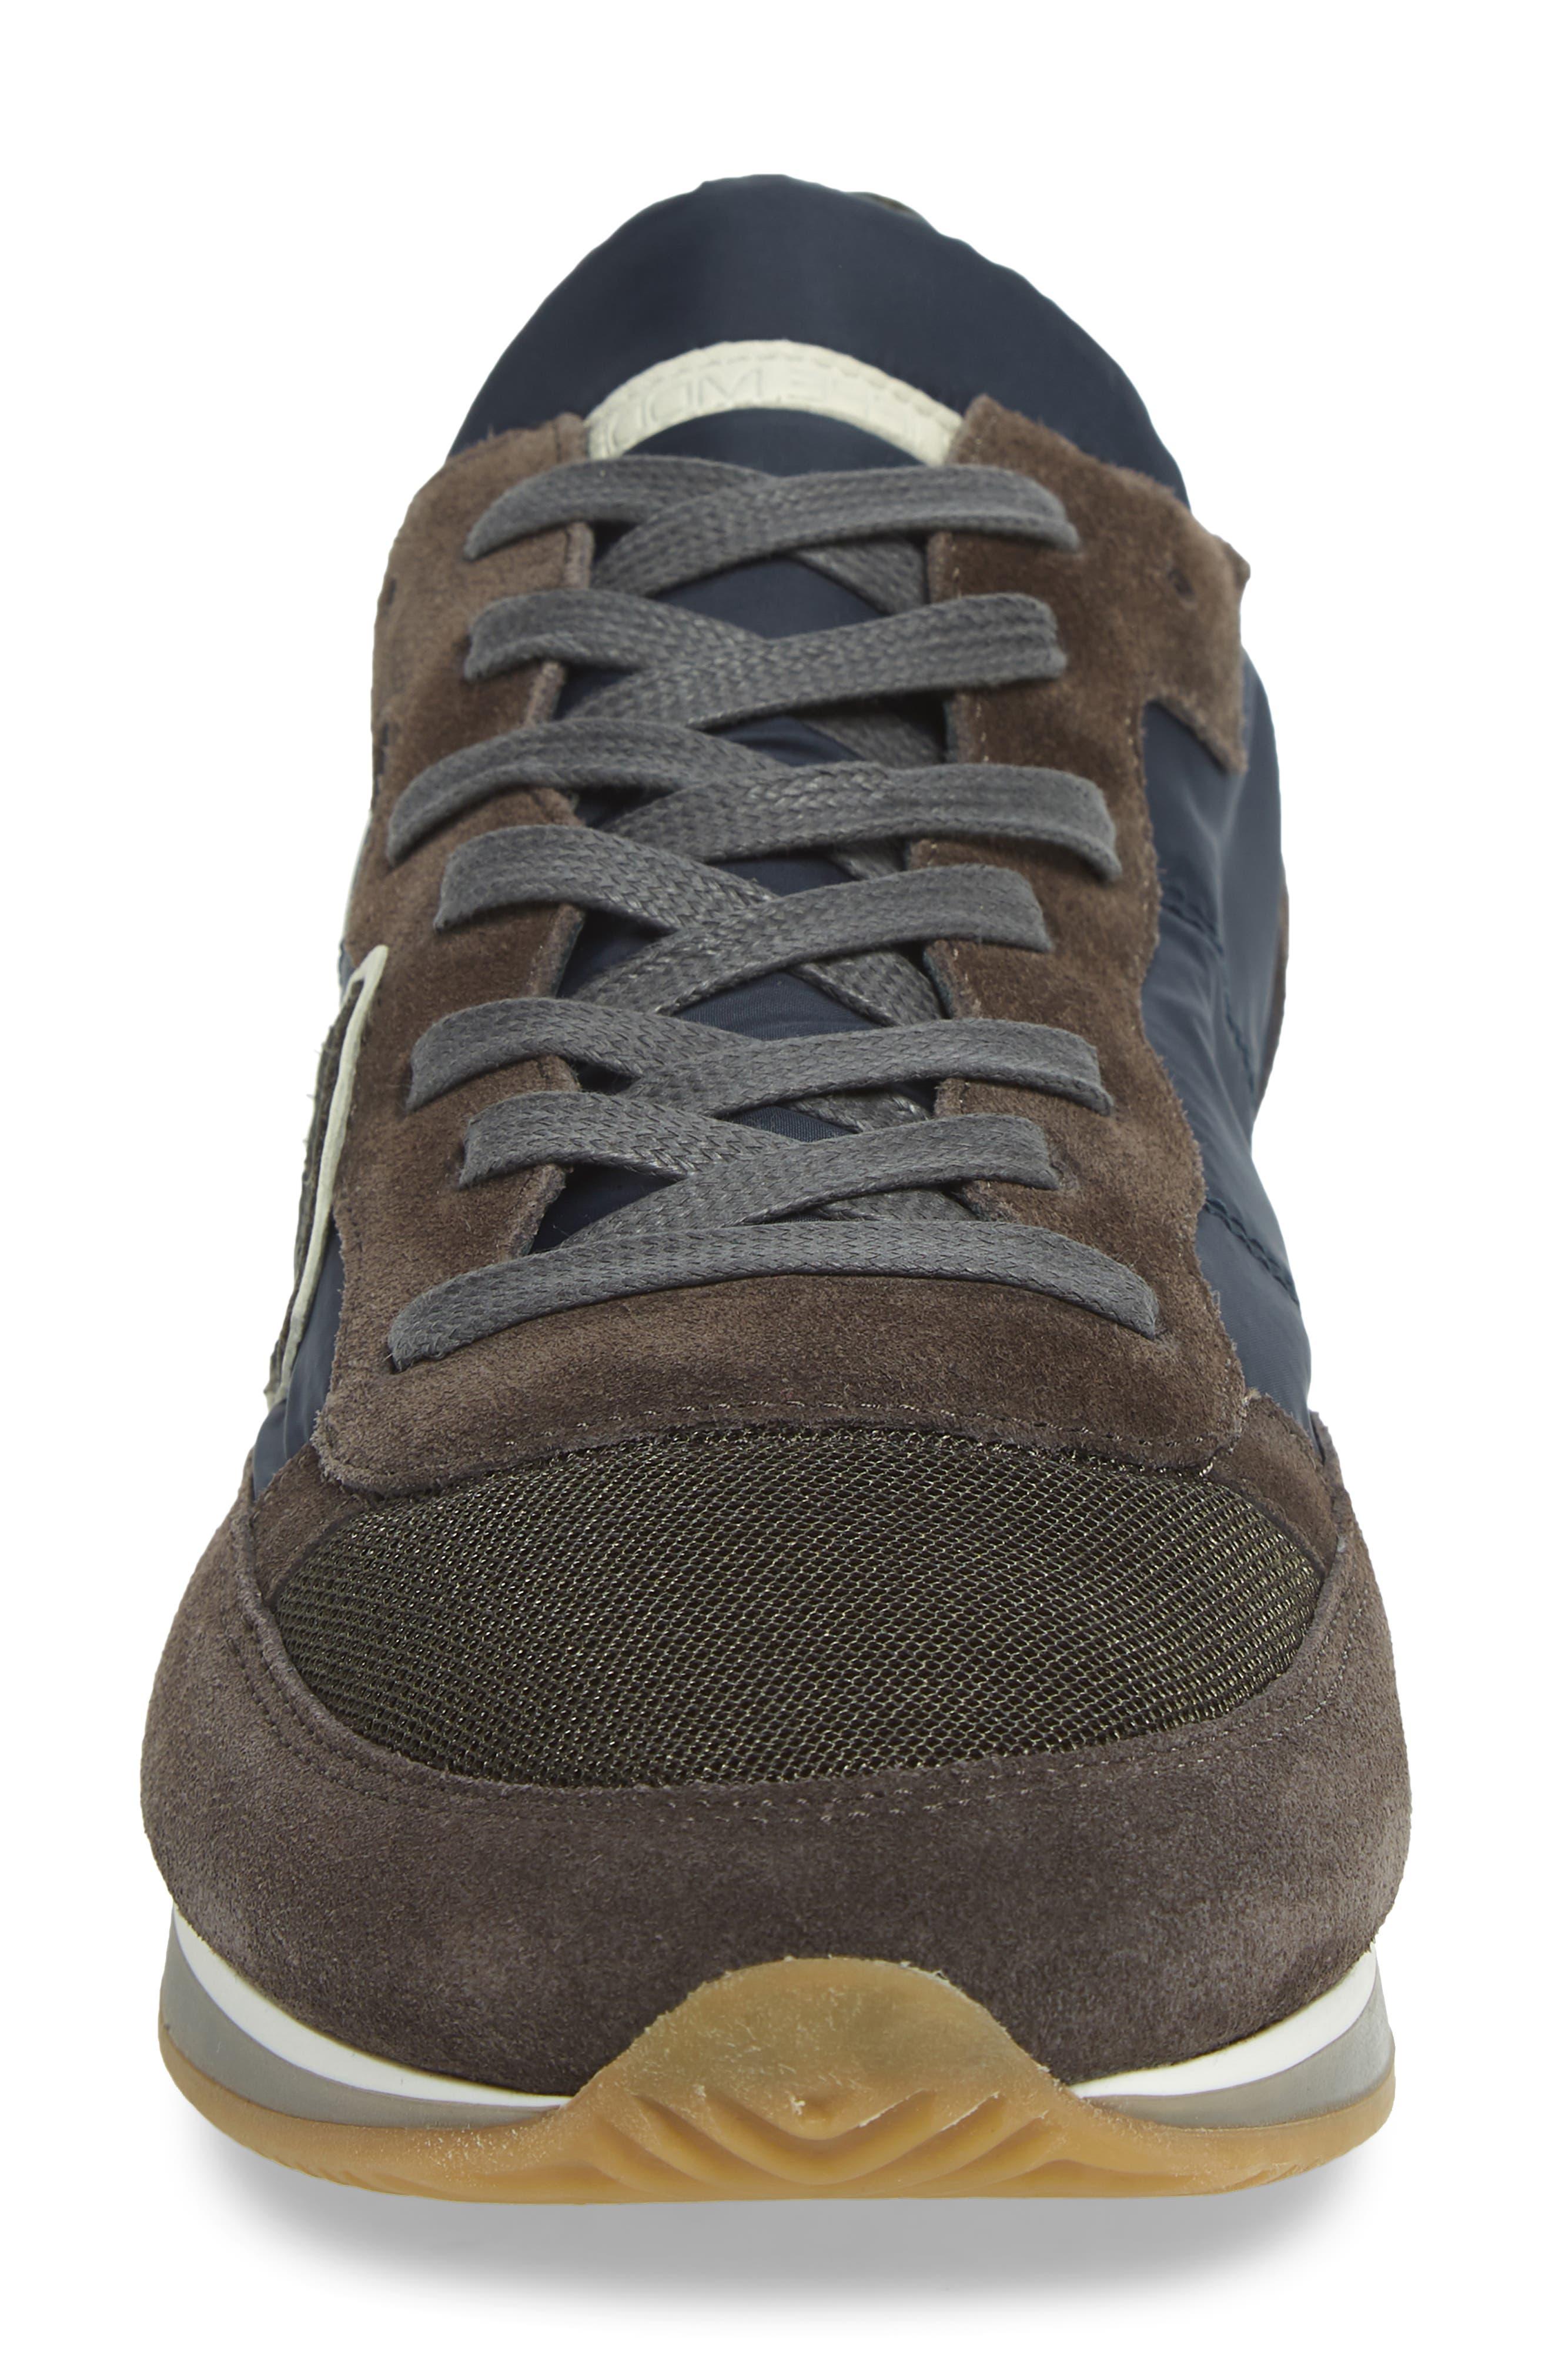 Tropez Low Top Sneaker,                             Alternate thumbnail 4, color,                             BLUE/ GREY